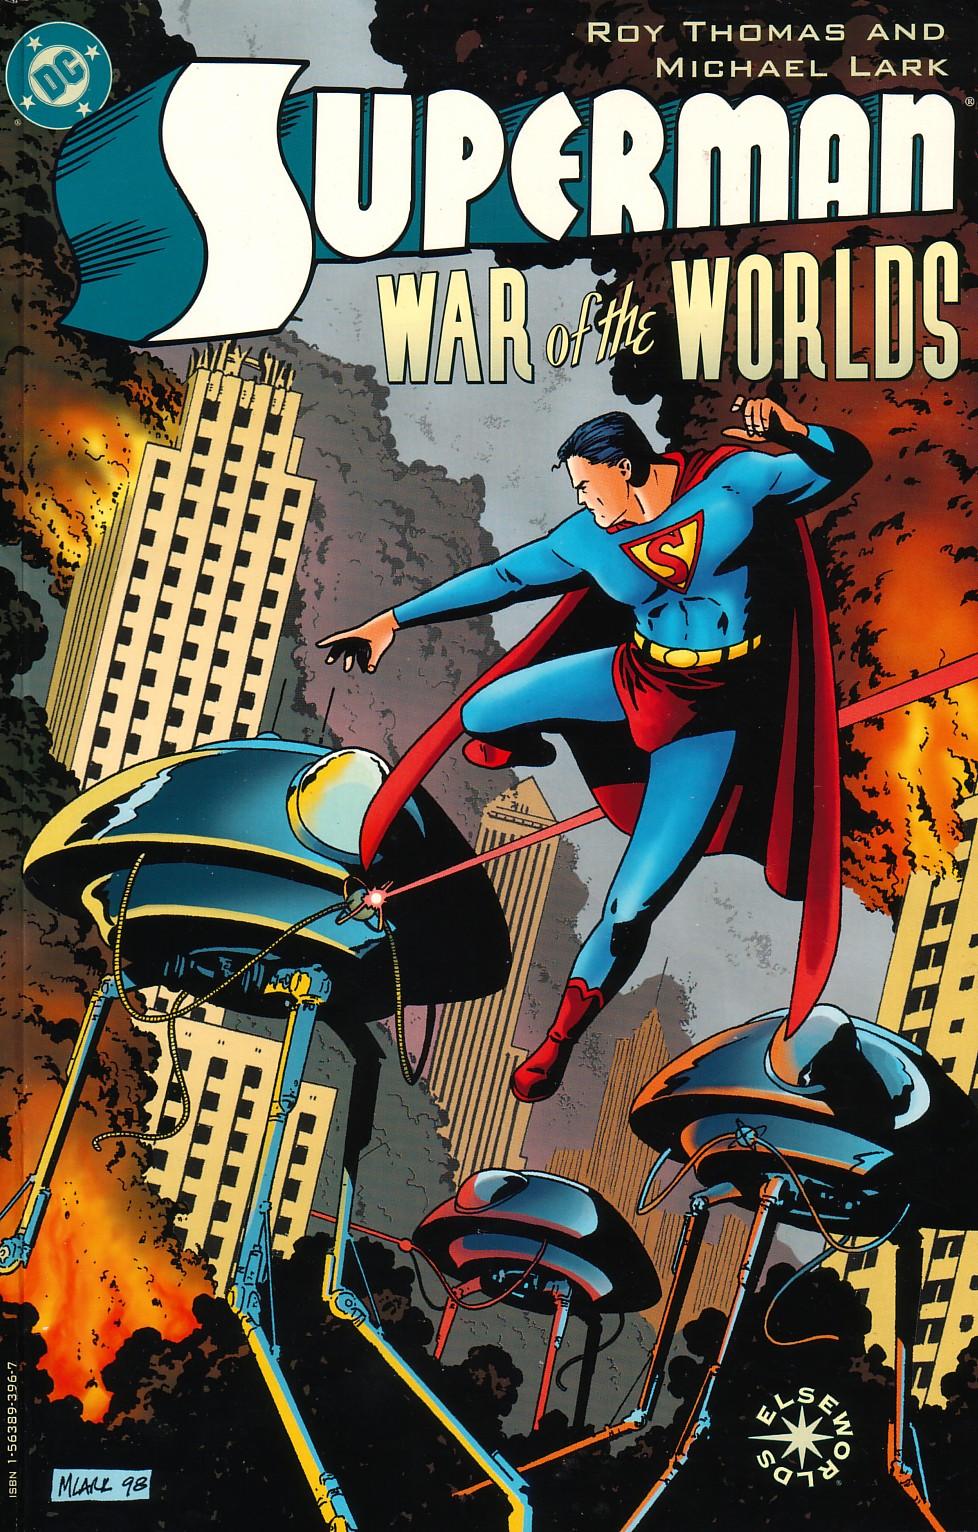 images.wikia.com/marvel_dc/images/0/05/Superman_War_of_the_Worlds.jpg